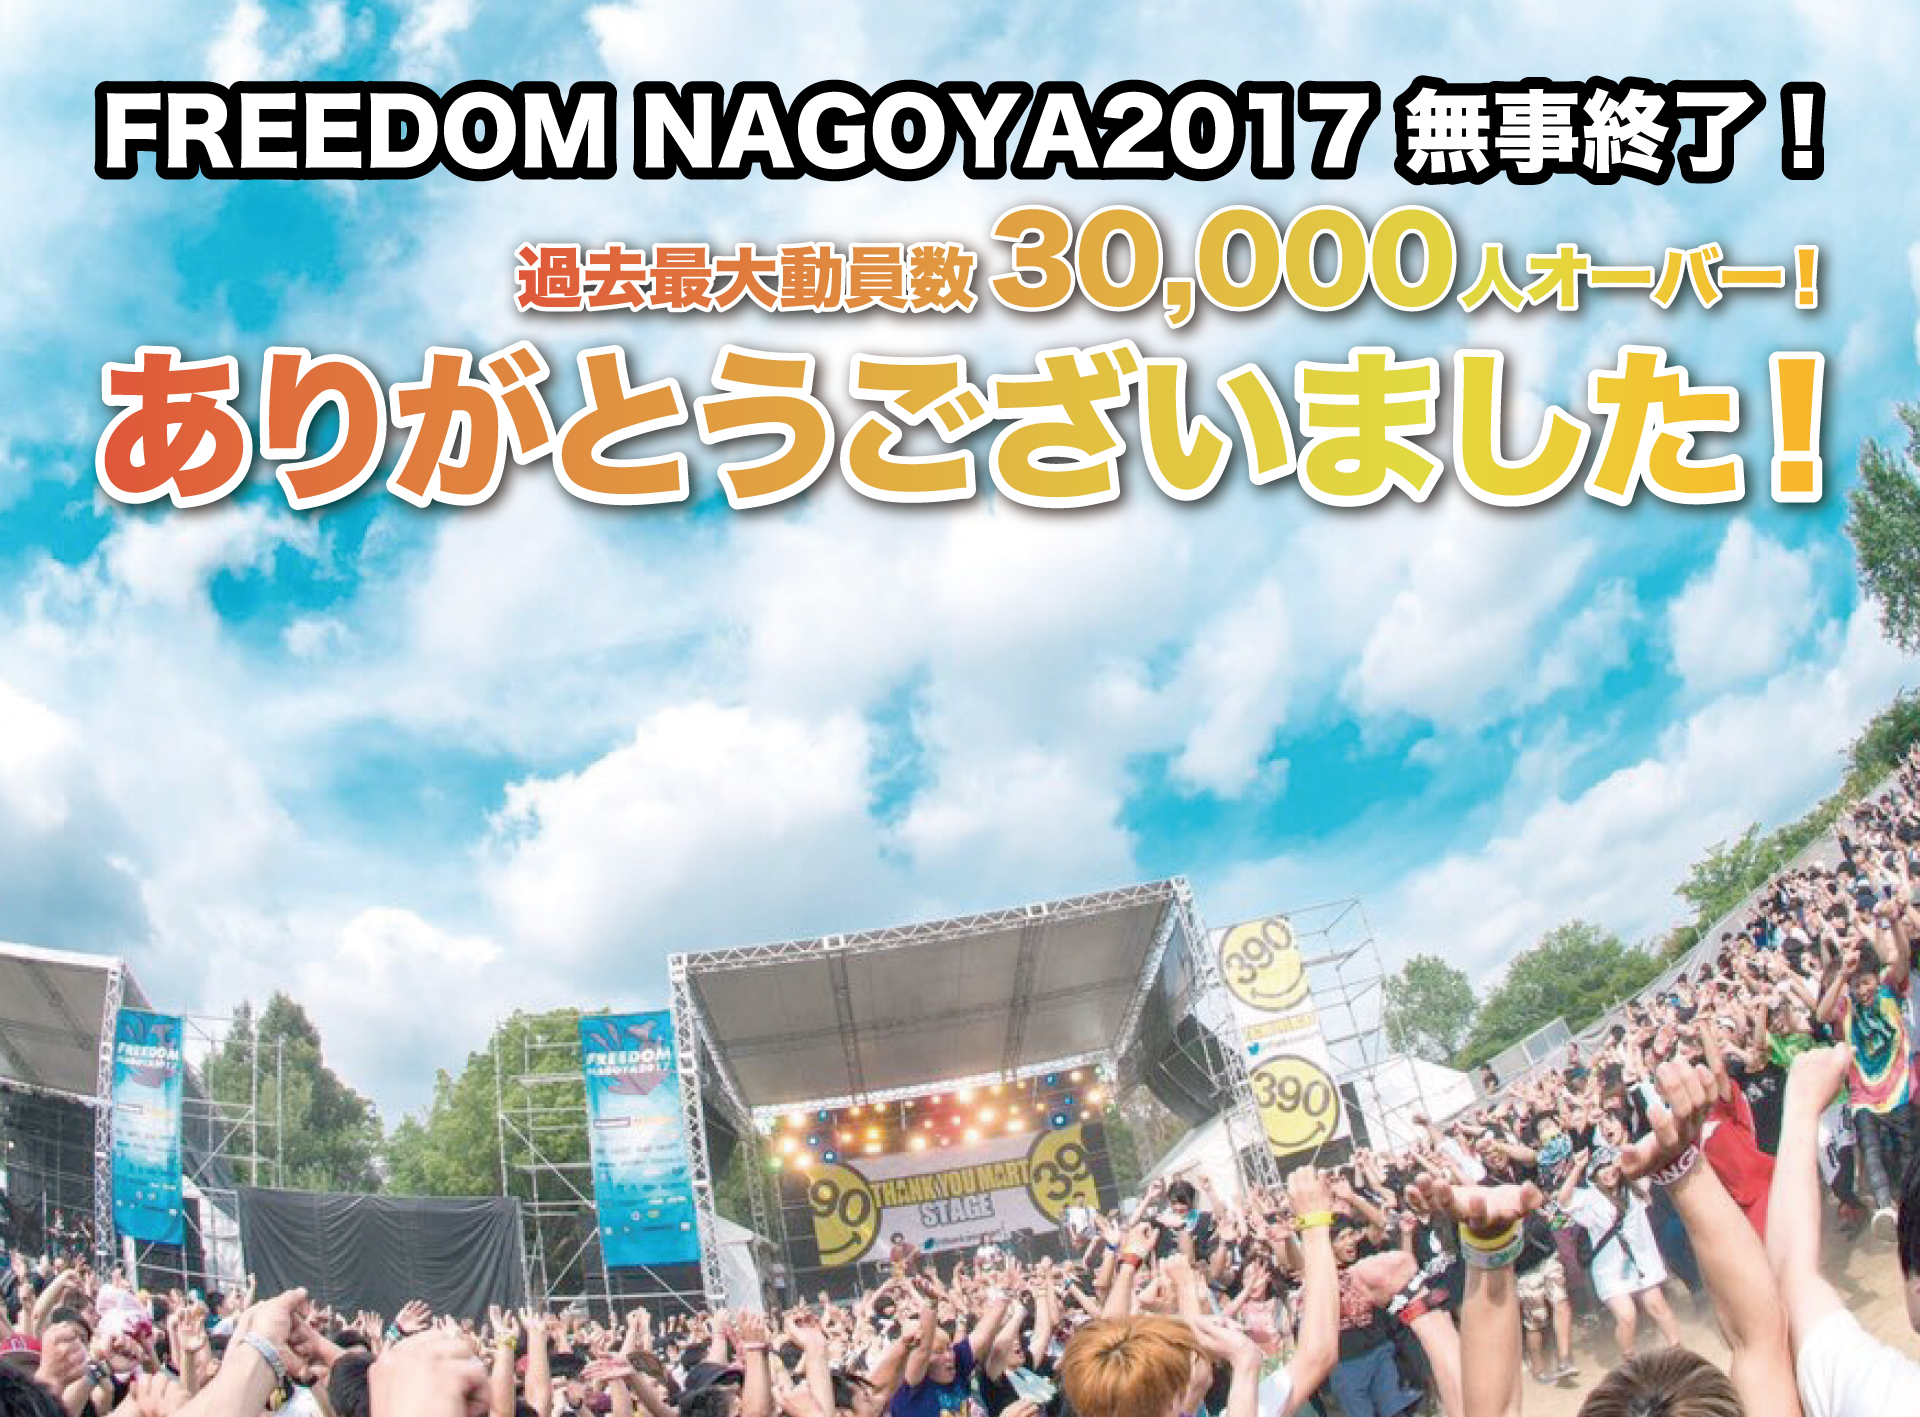 FREEDOM_end 2017